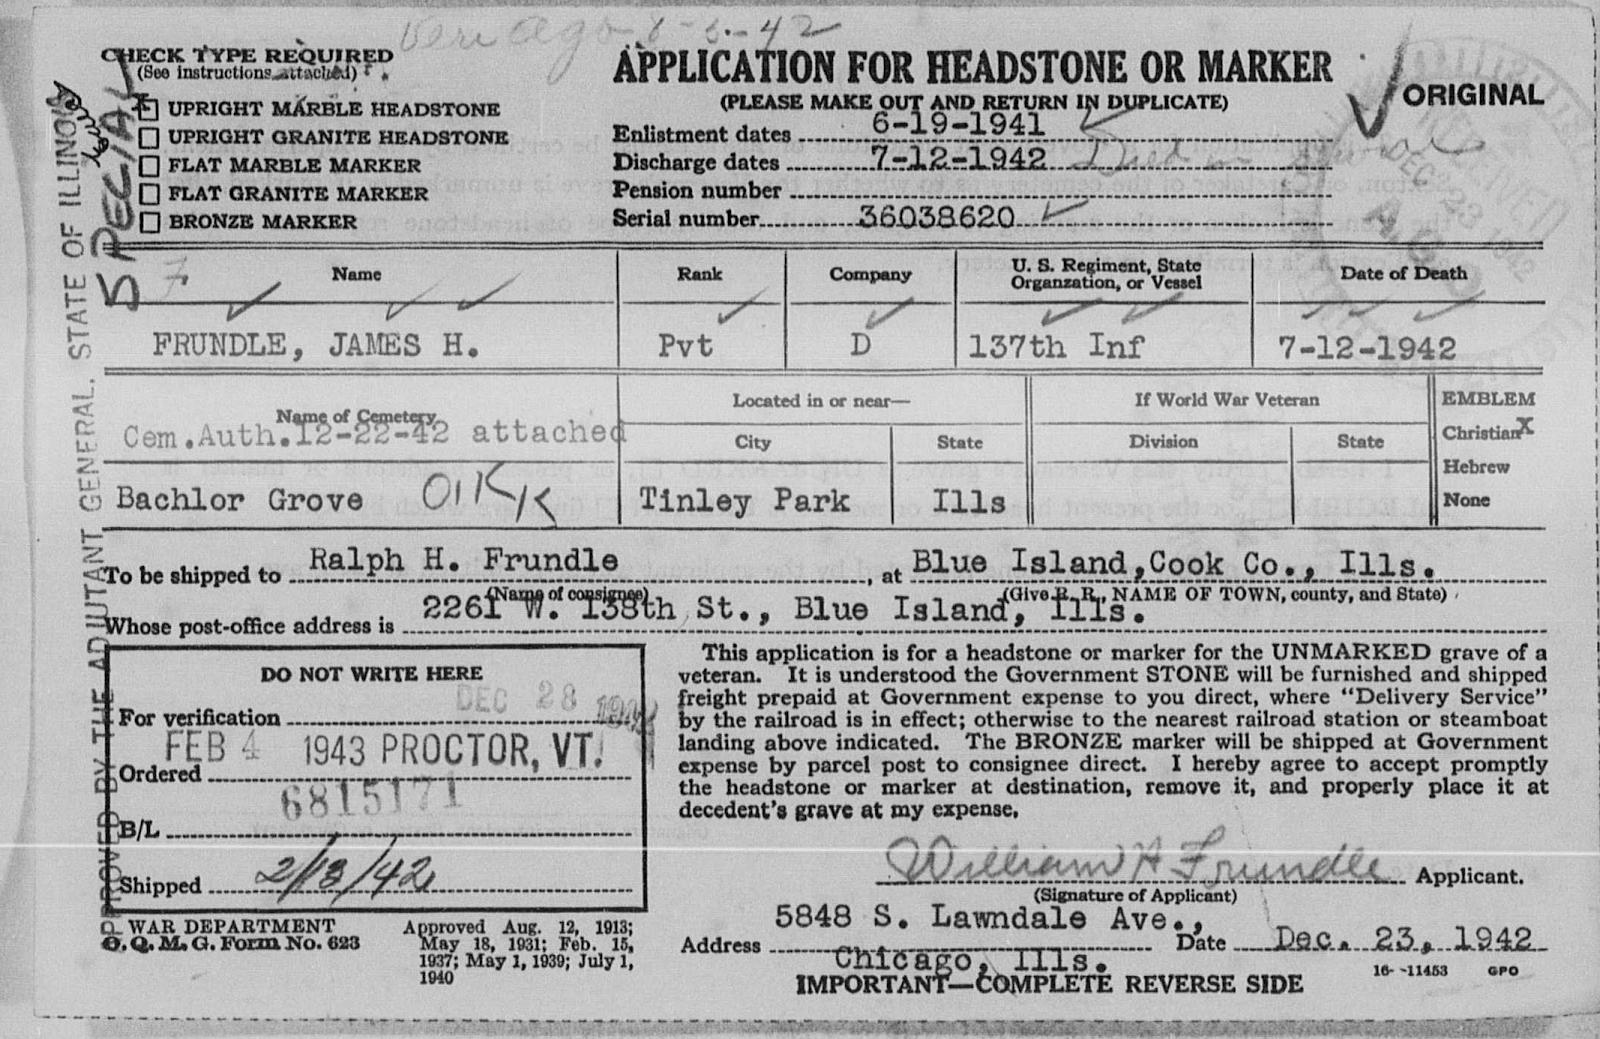 James H. Frundle  Headstone Application